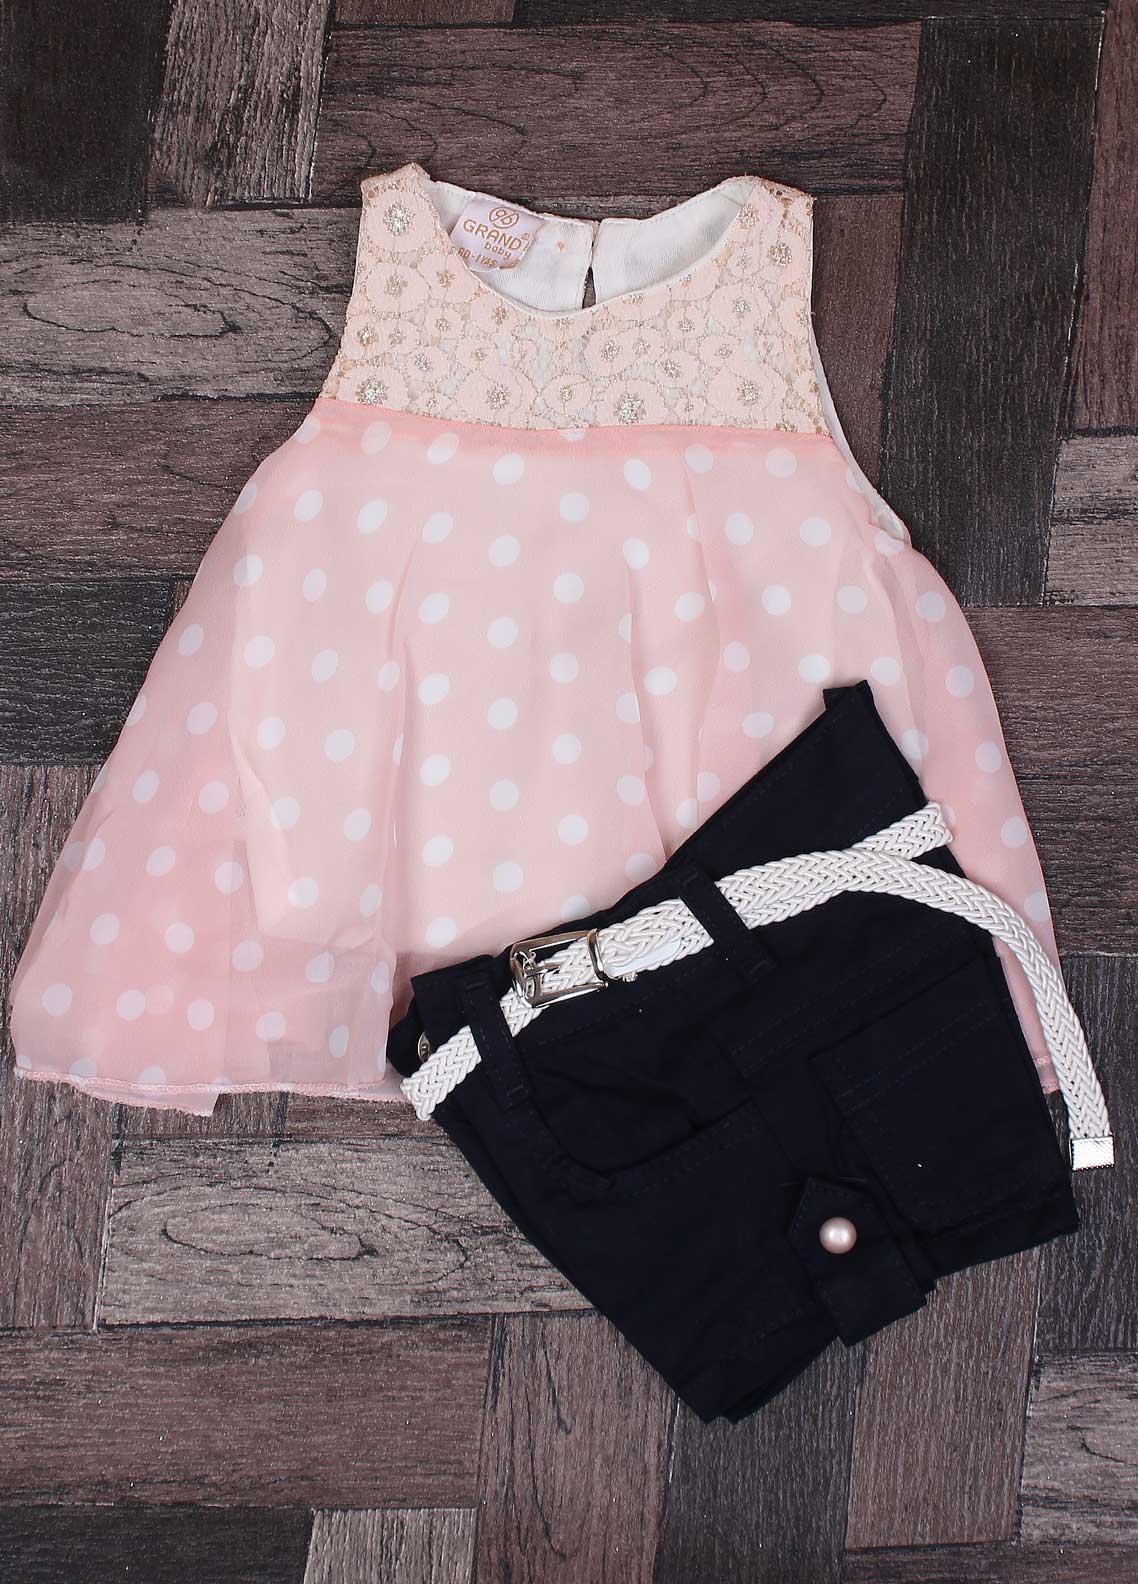 Sanaulla Exclusive Range Mix Cotton Fancy Suits for Girls -   020 Pink